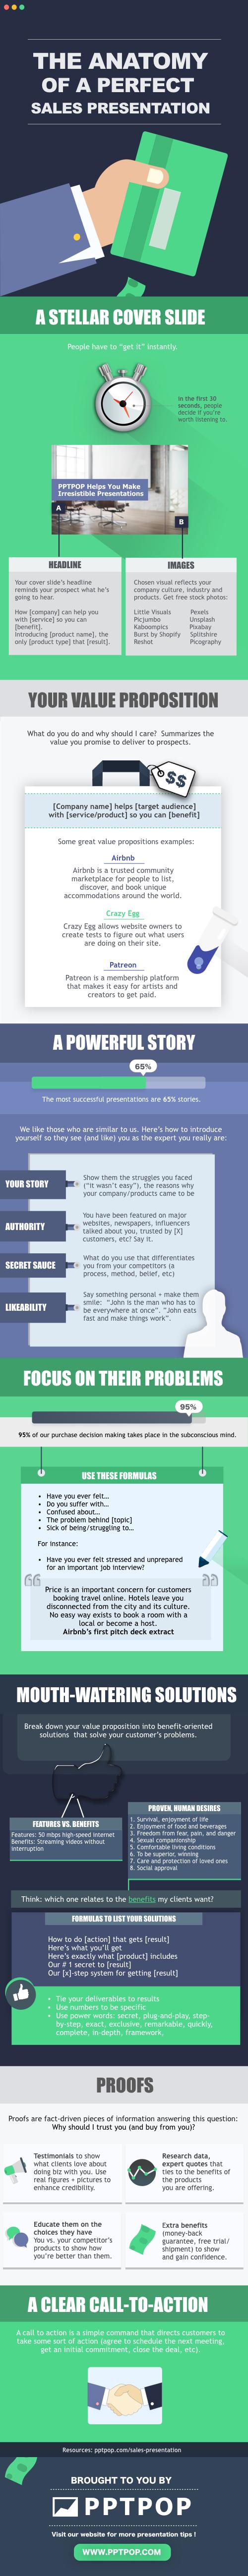 making powerful sales presentations pocket guide